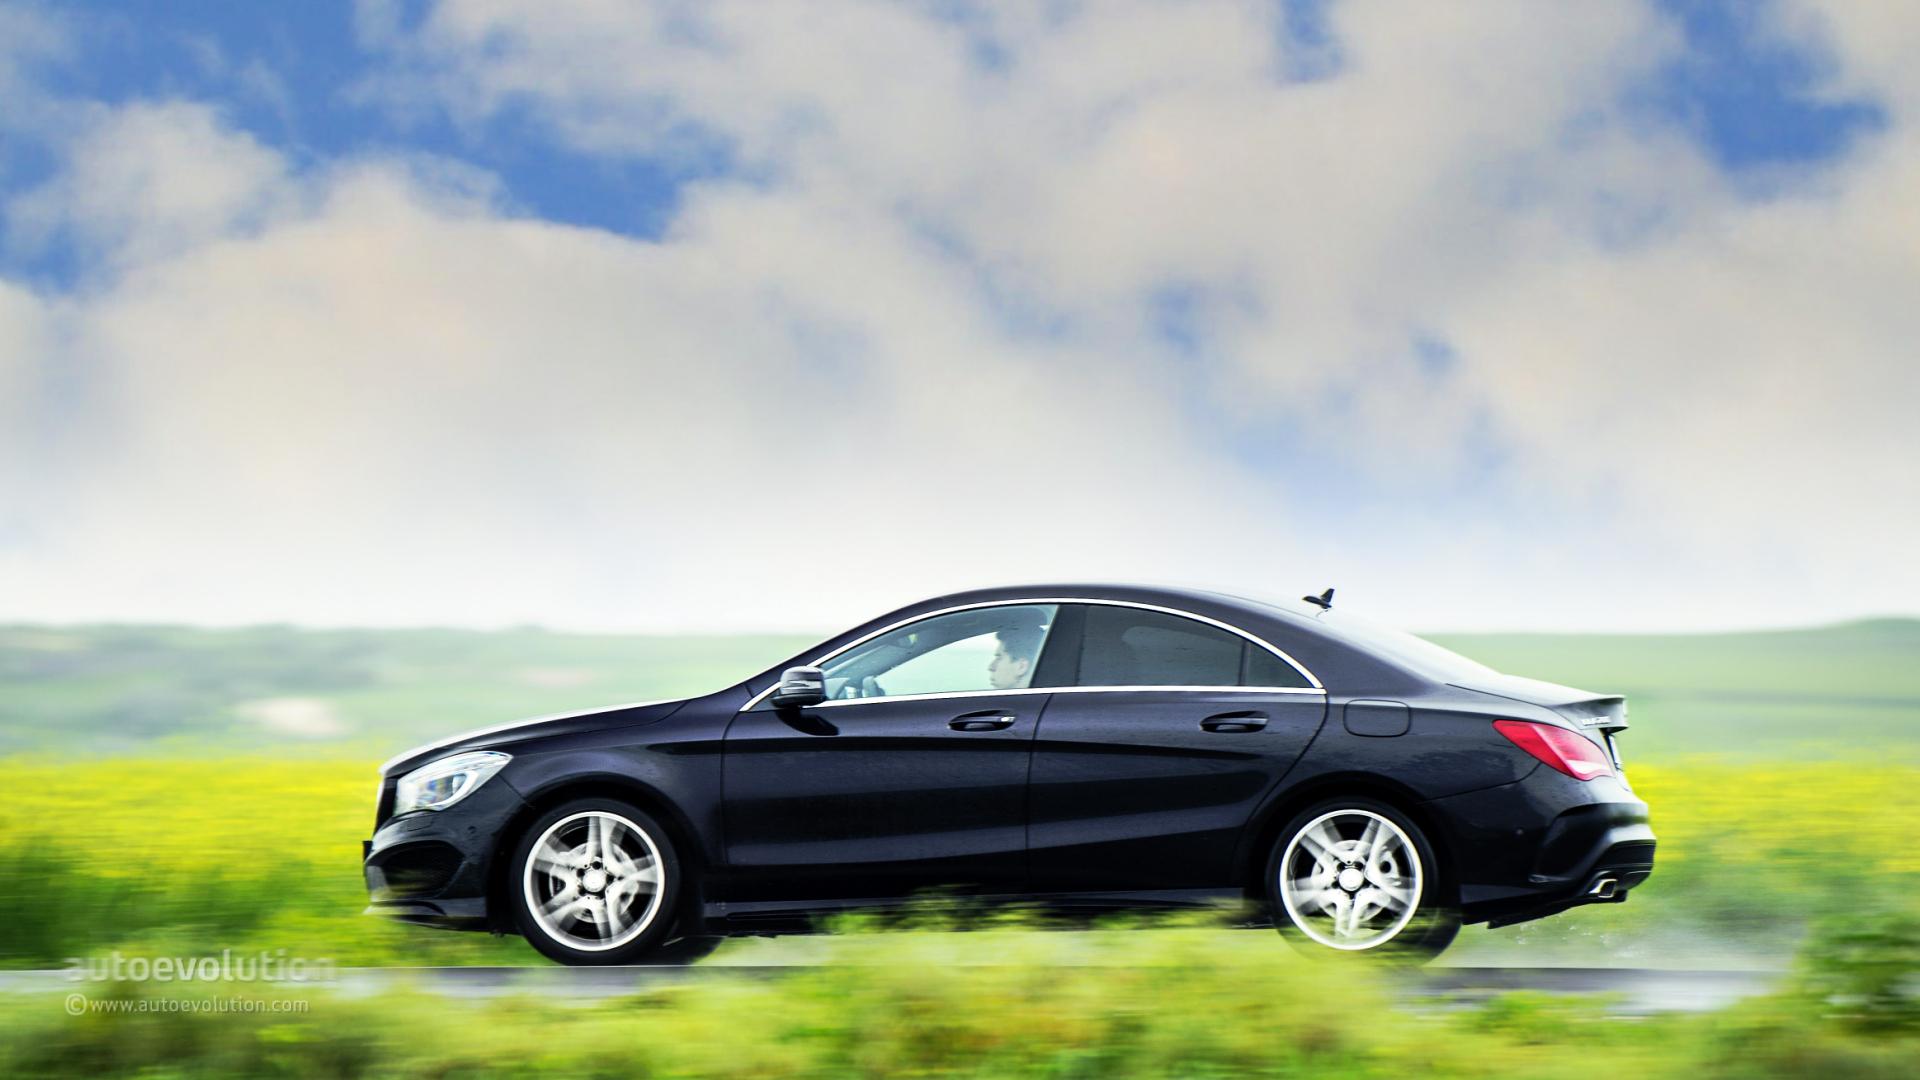 Mercedes benz cla review autoevolution for 2014 mercedes benz cla 250 review